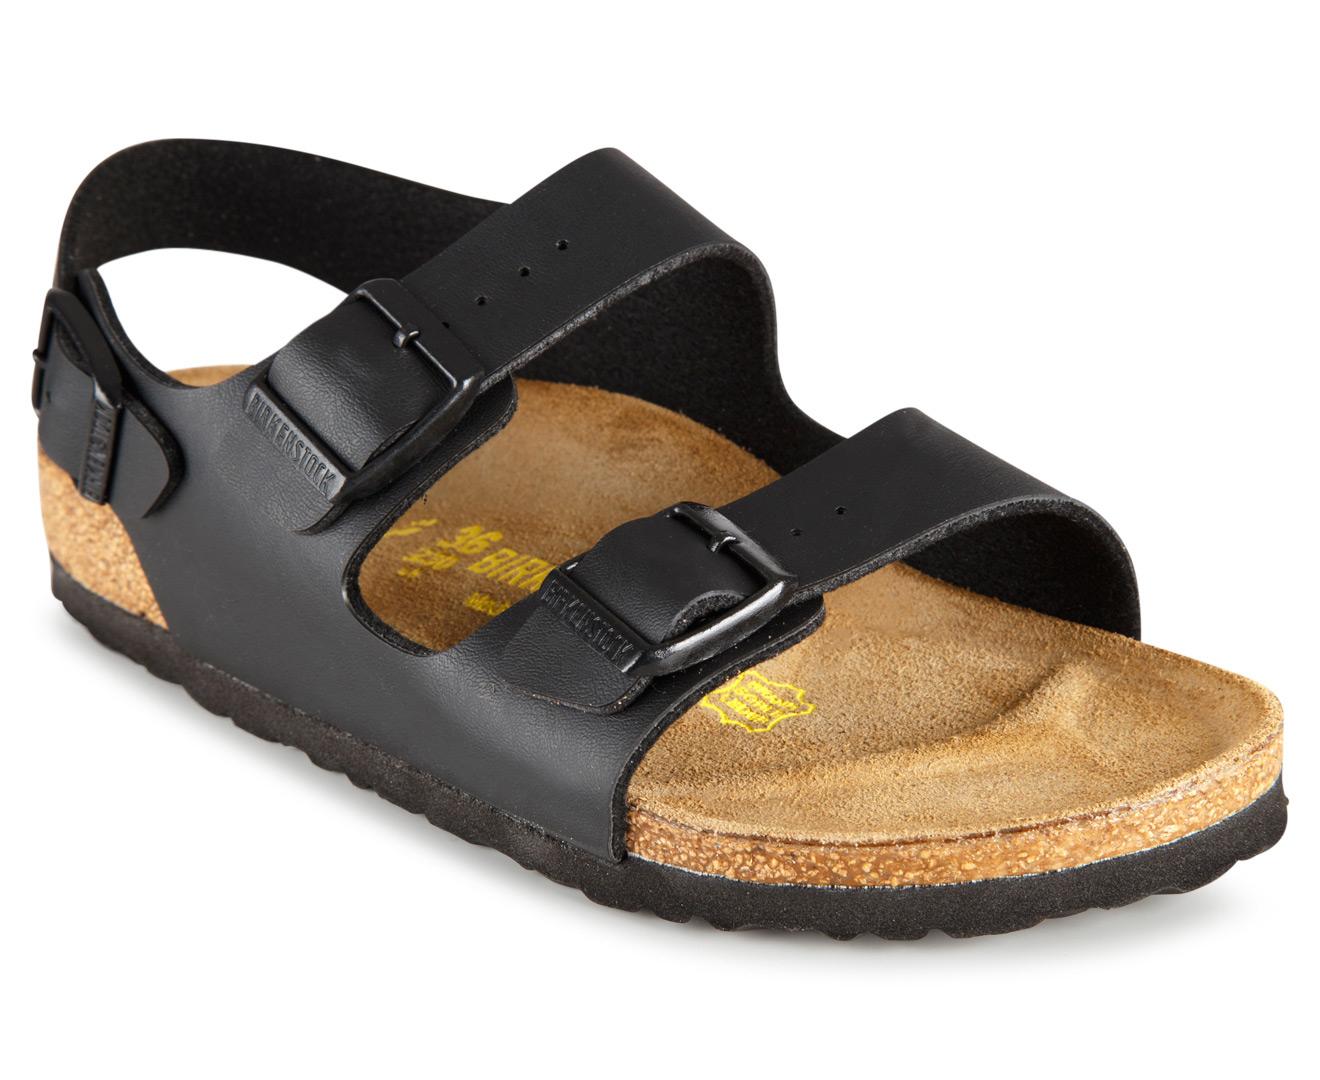 0847ea5dd2d5 Birkenstock Unisex Milano Narrow Fit Sandal - Black